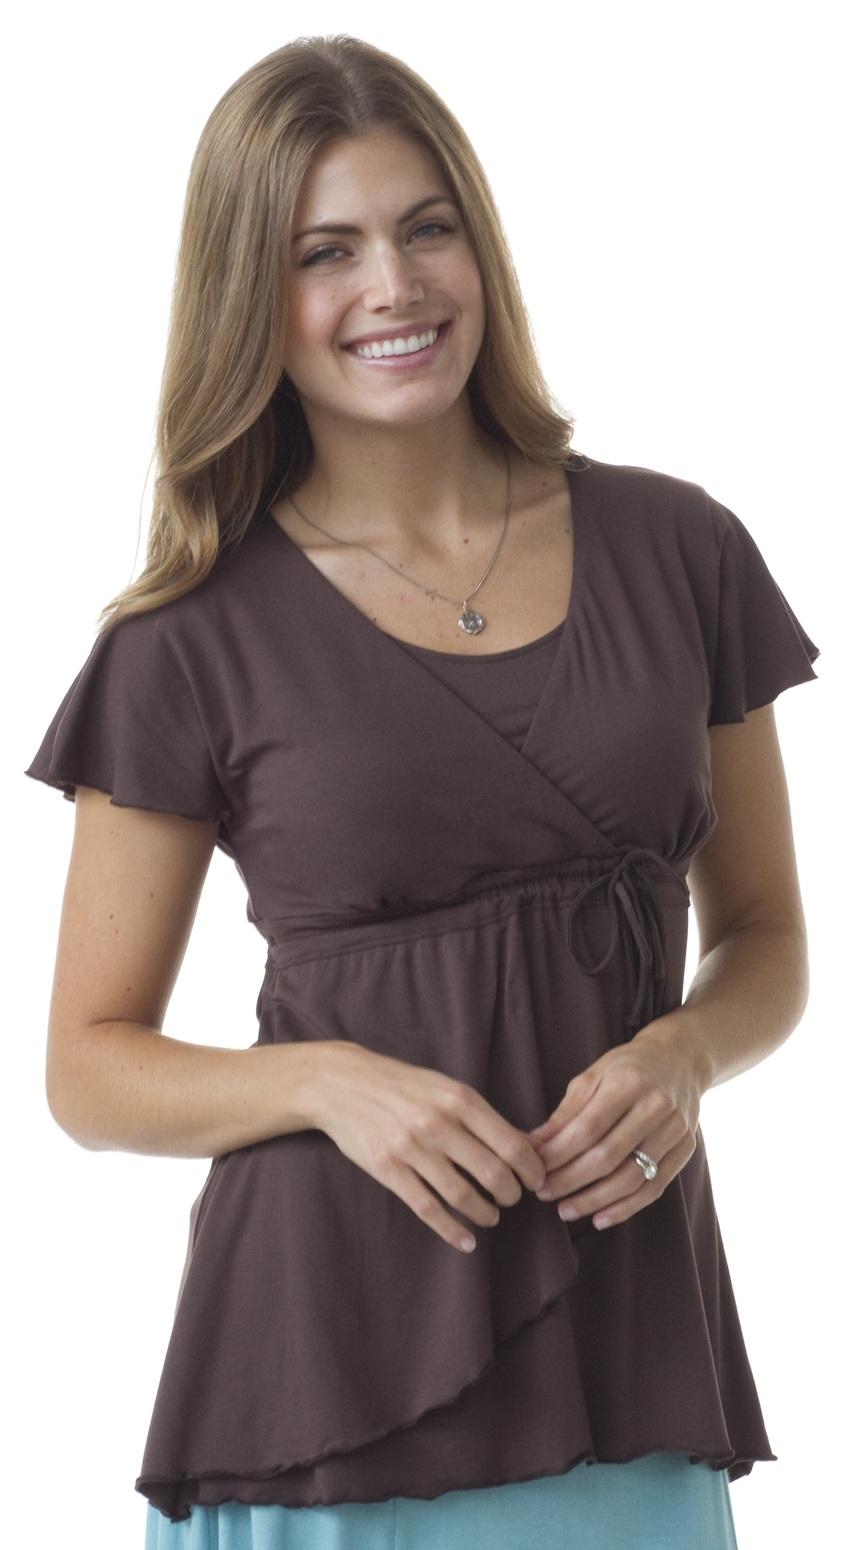 nixilu-corella-nursing-top-brown.jpg